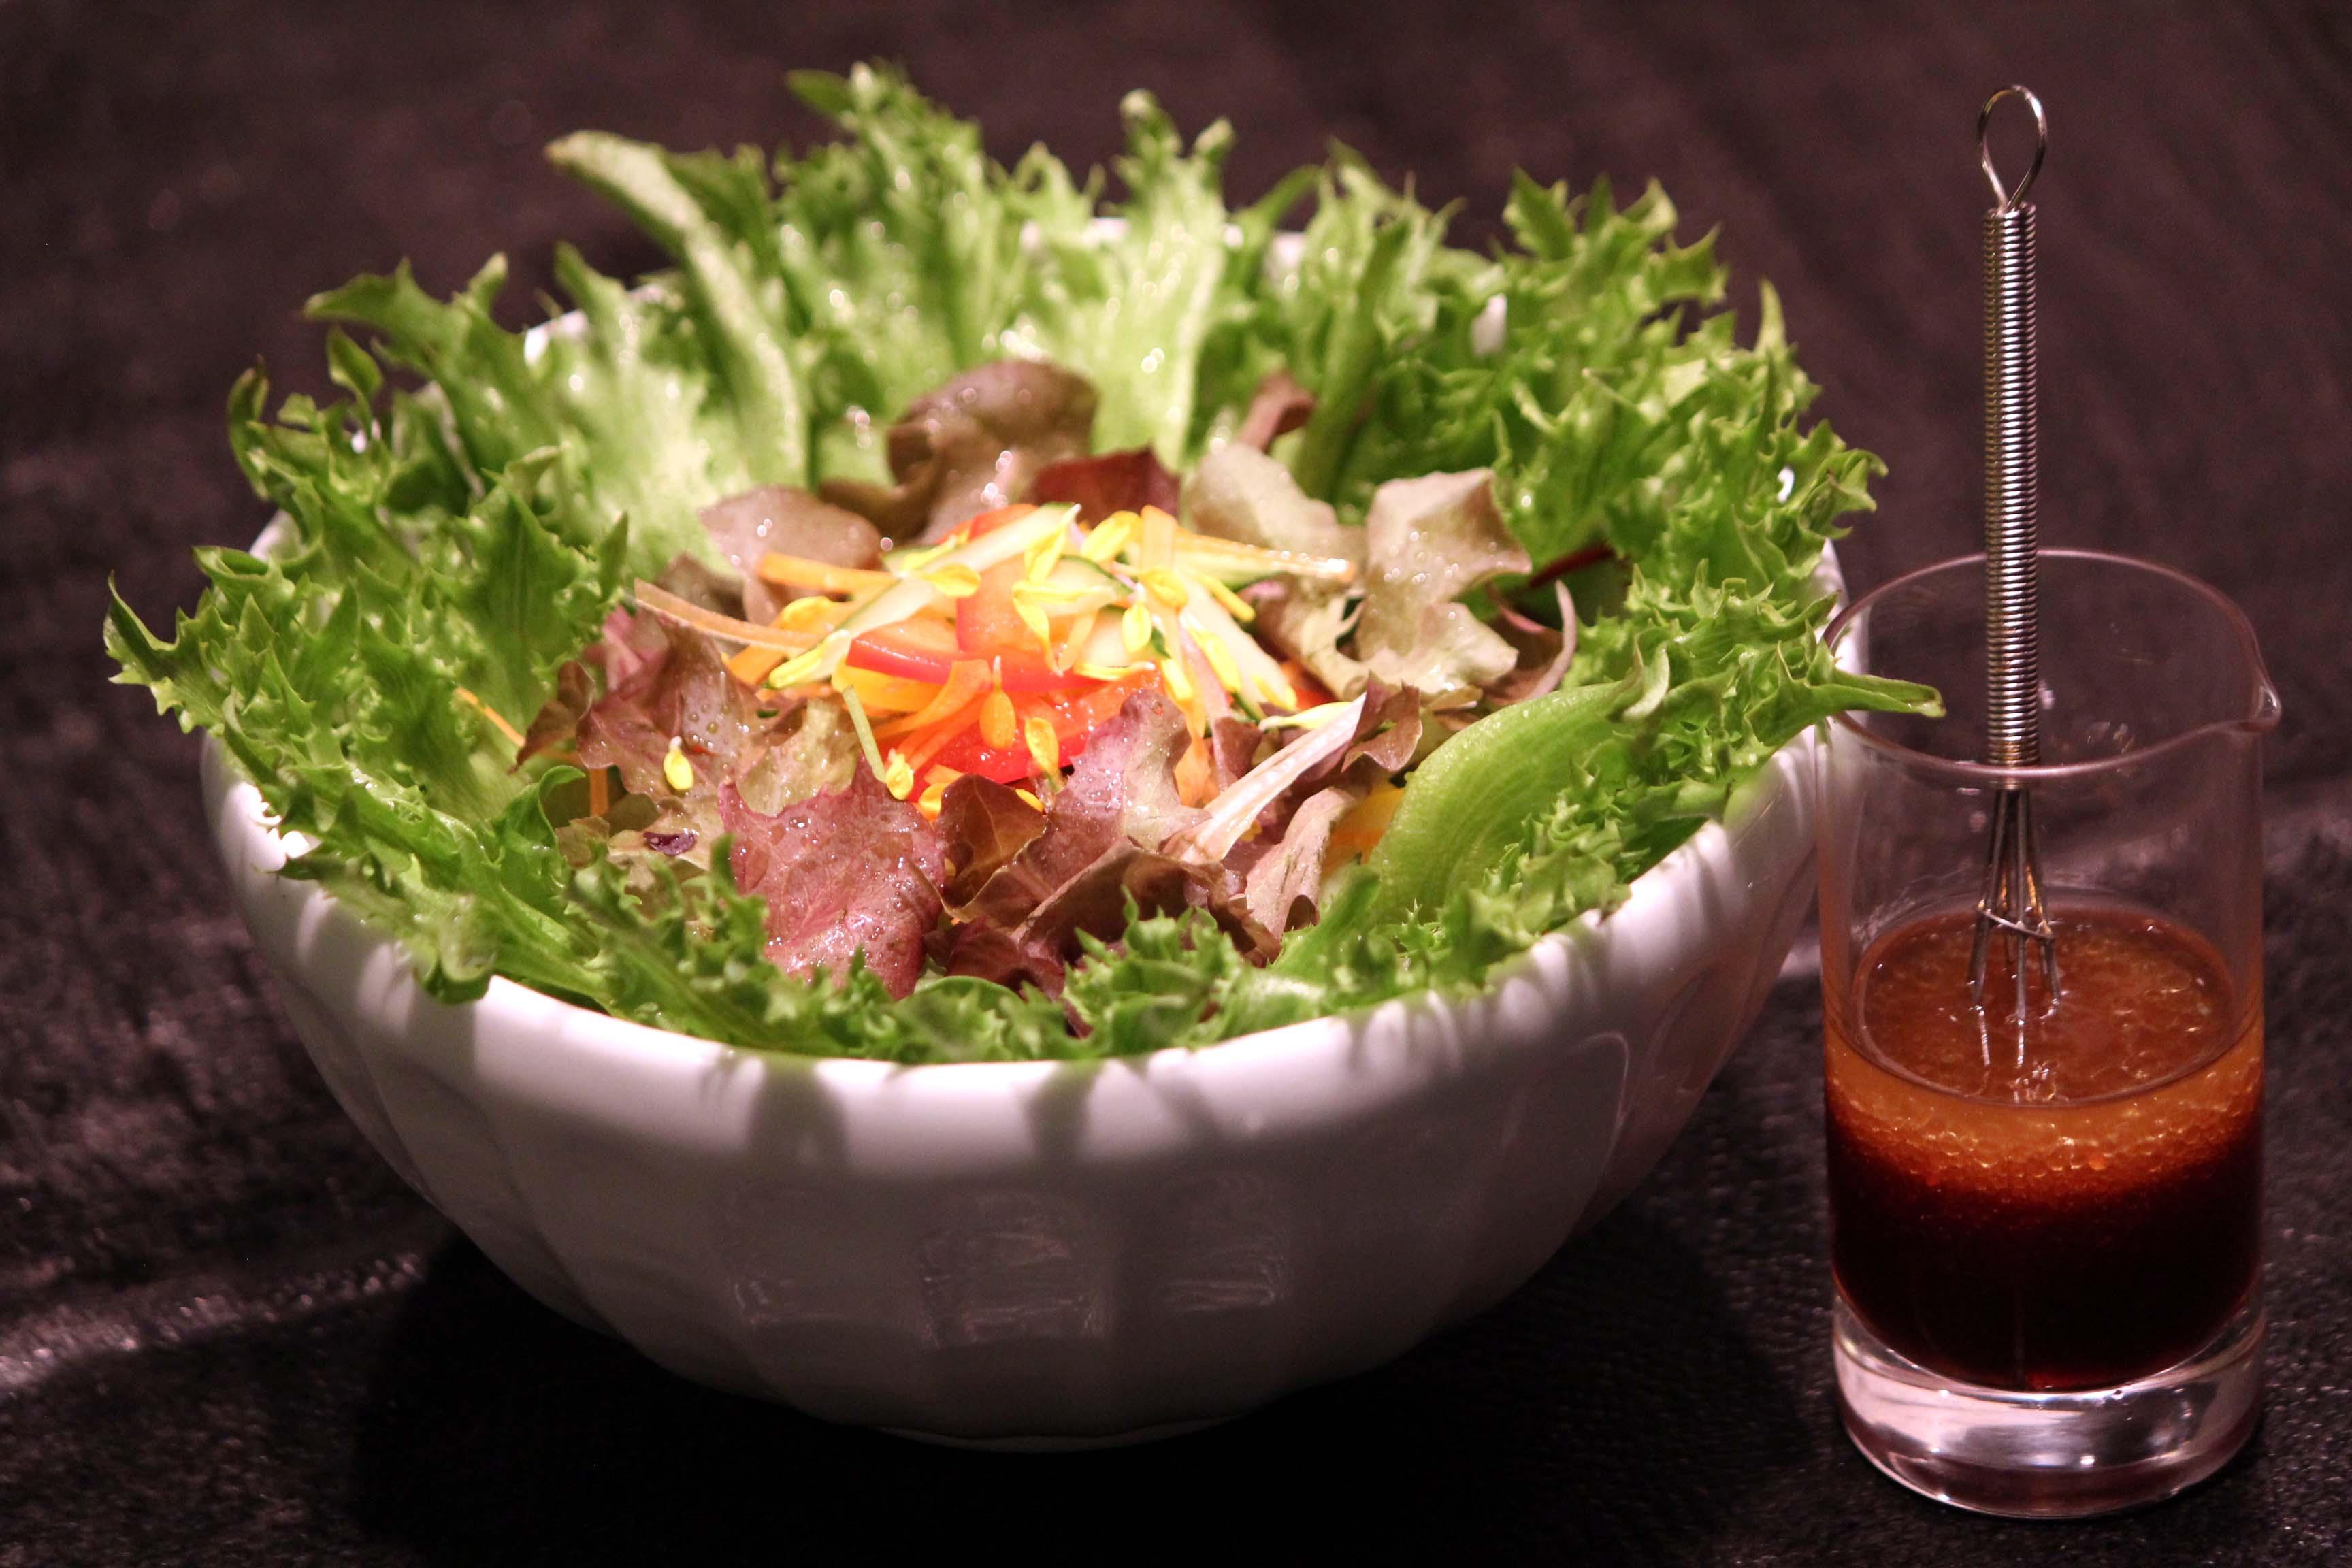 Salad (image)